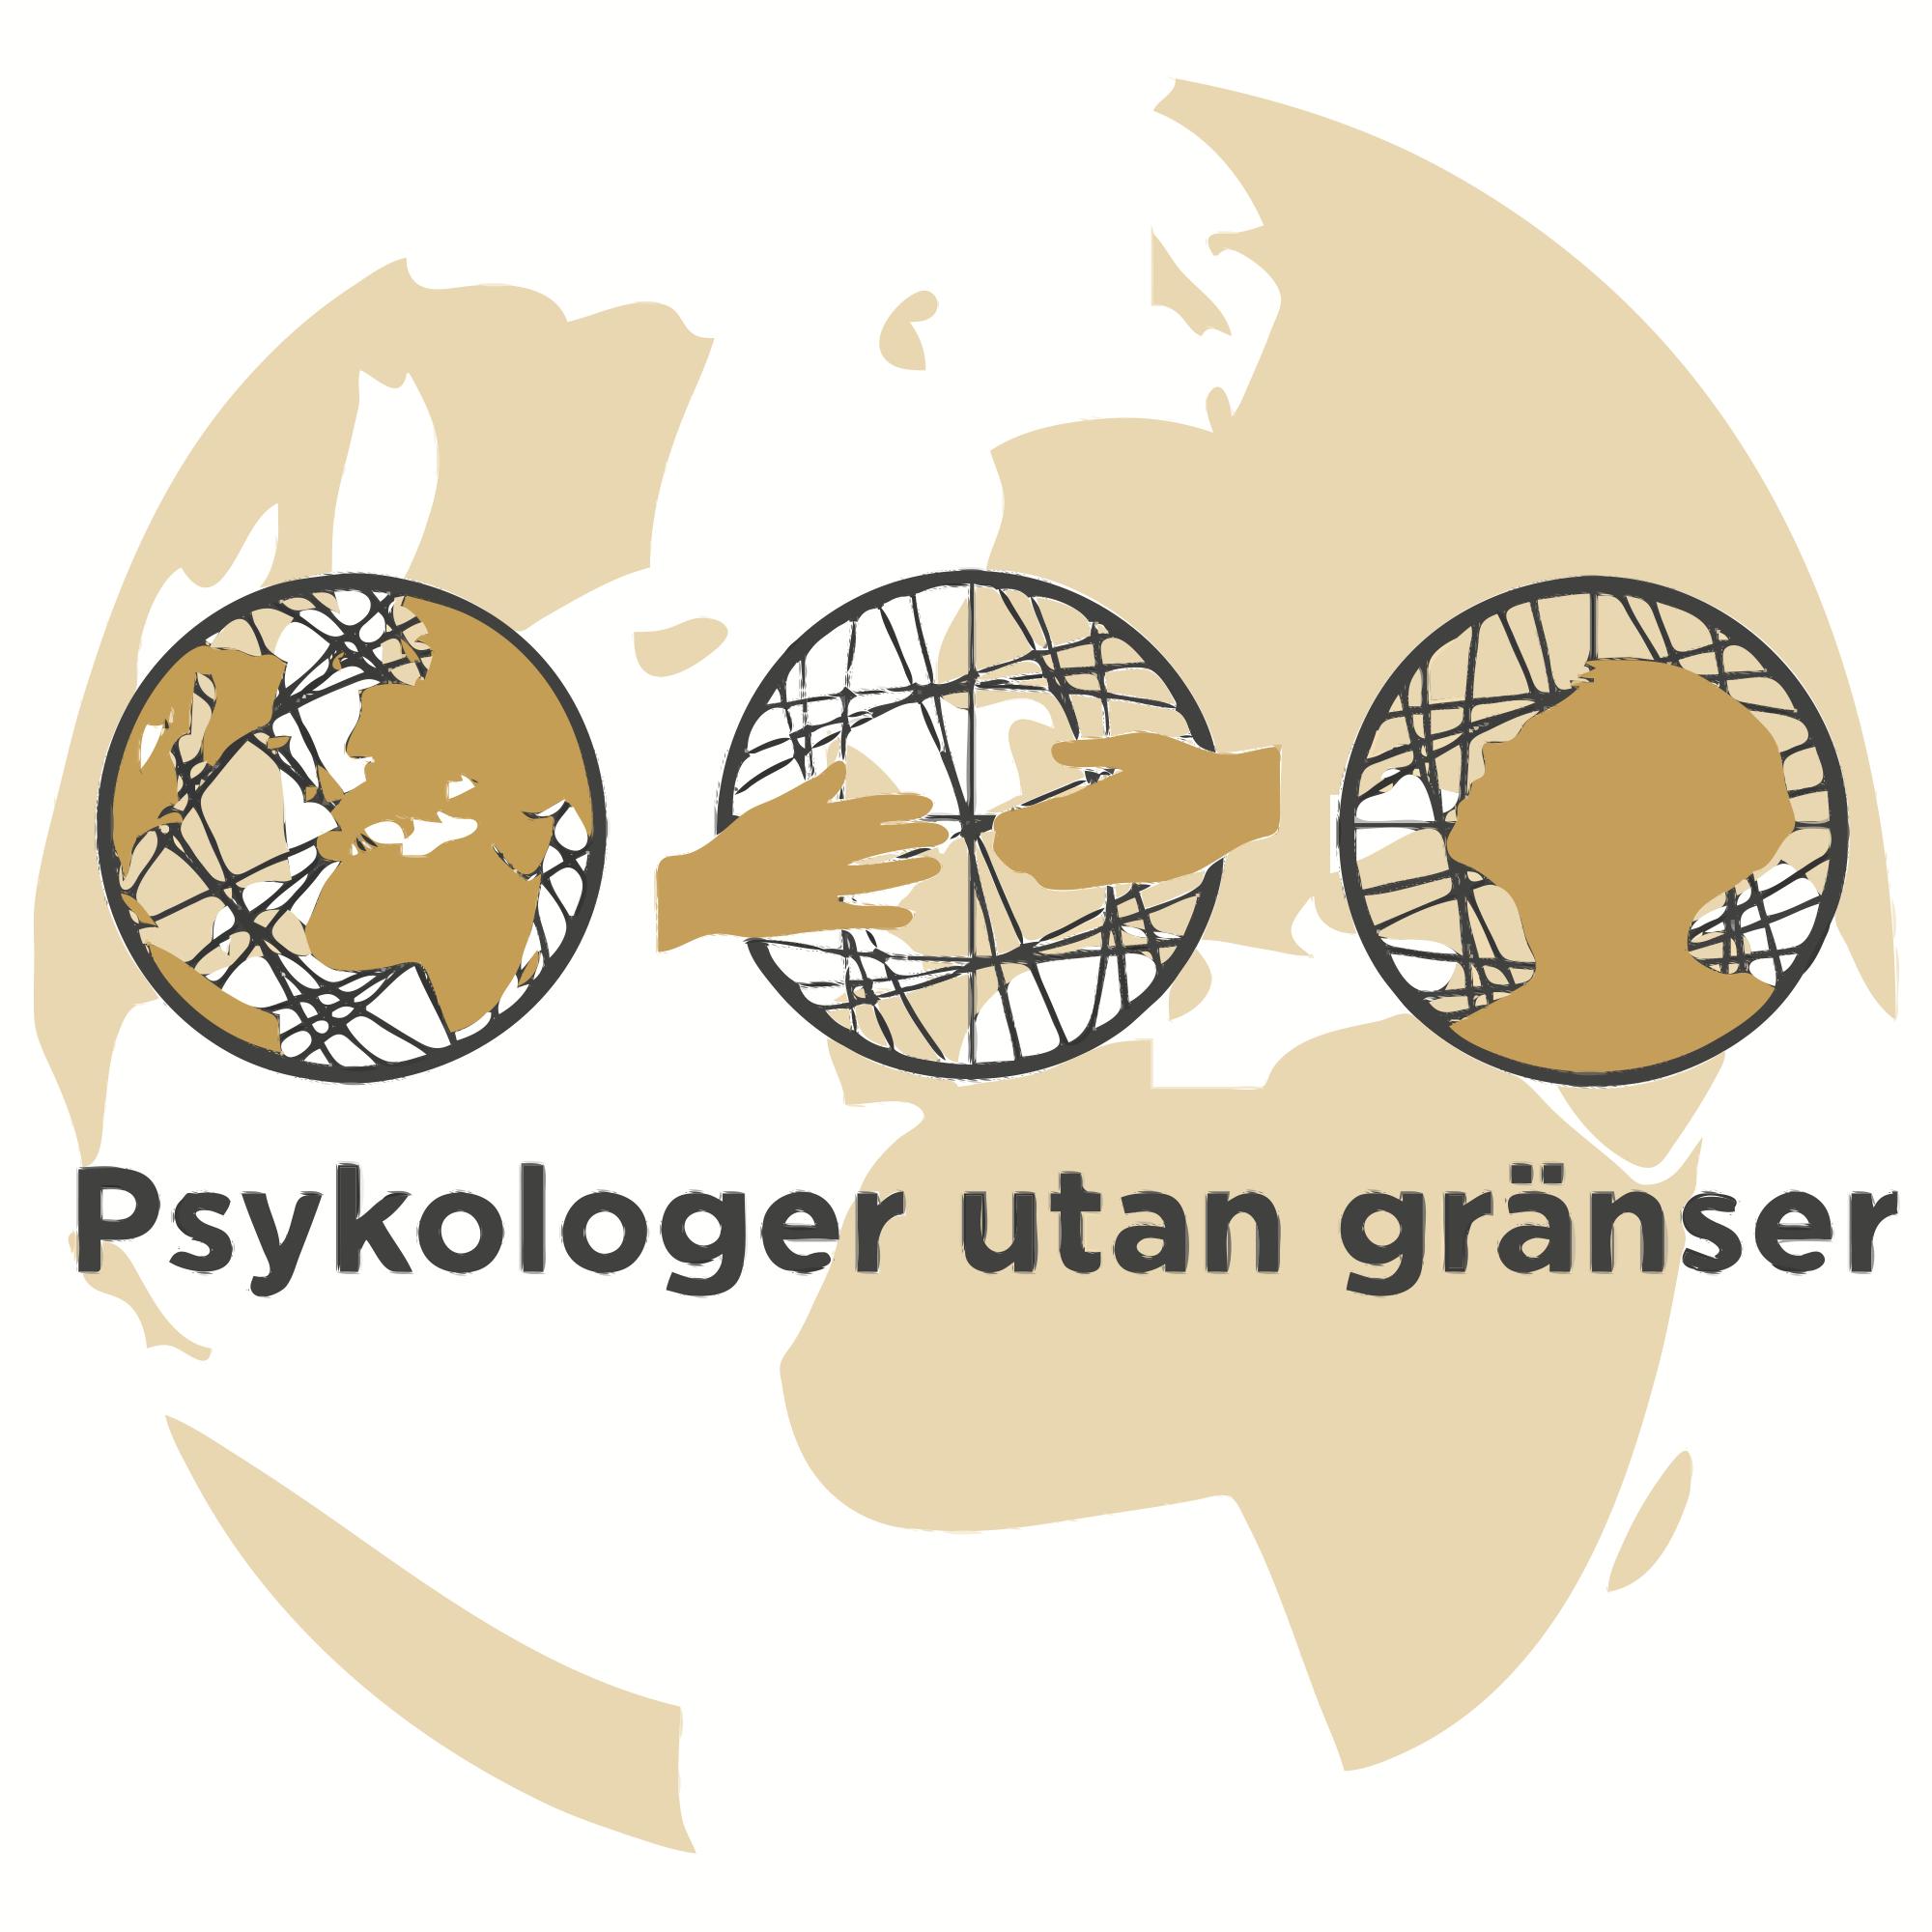 Phykologer utan gränser